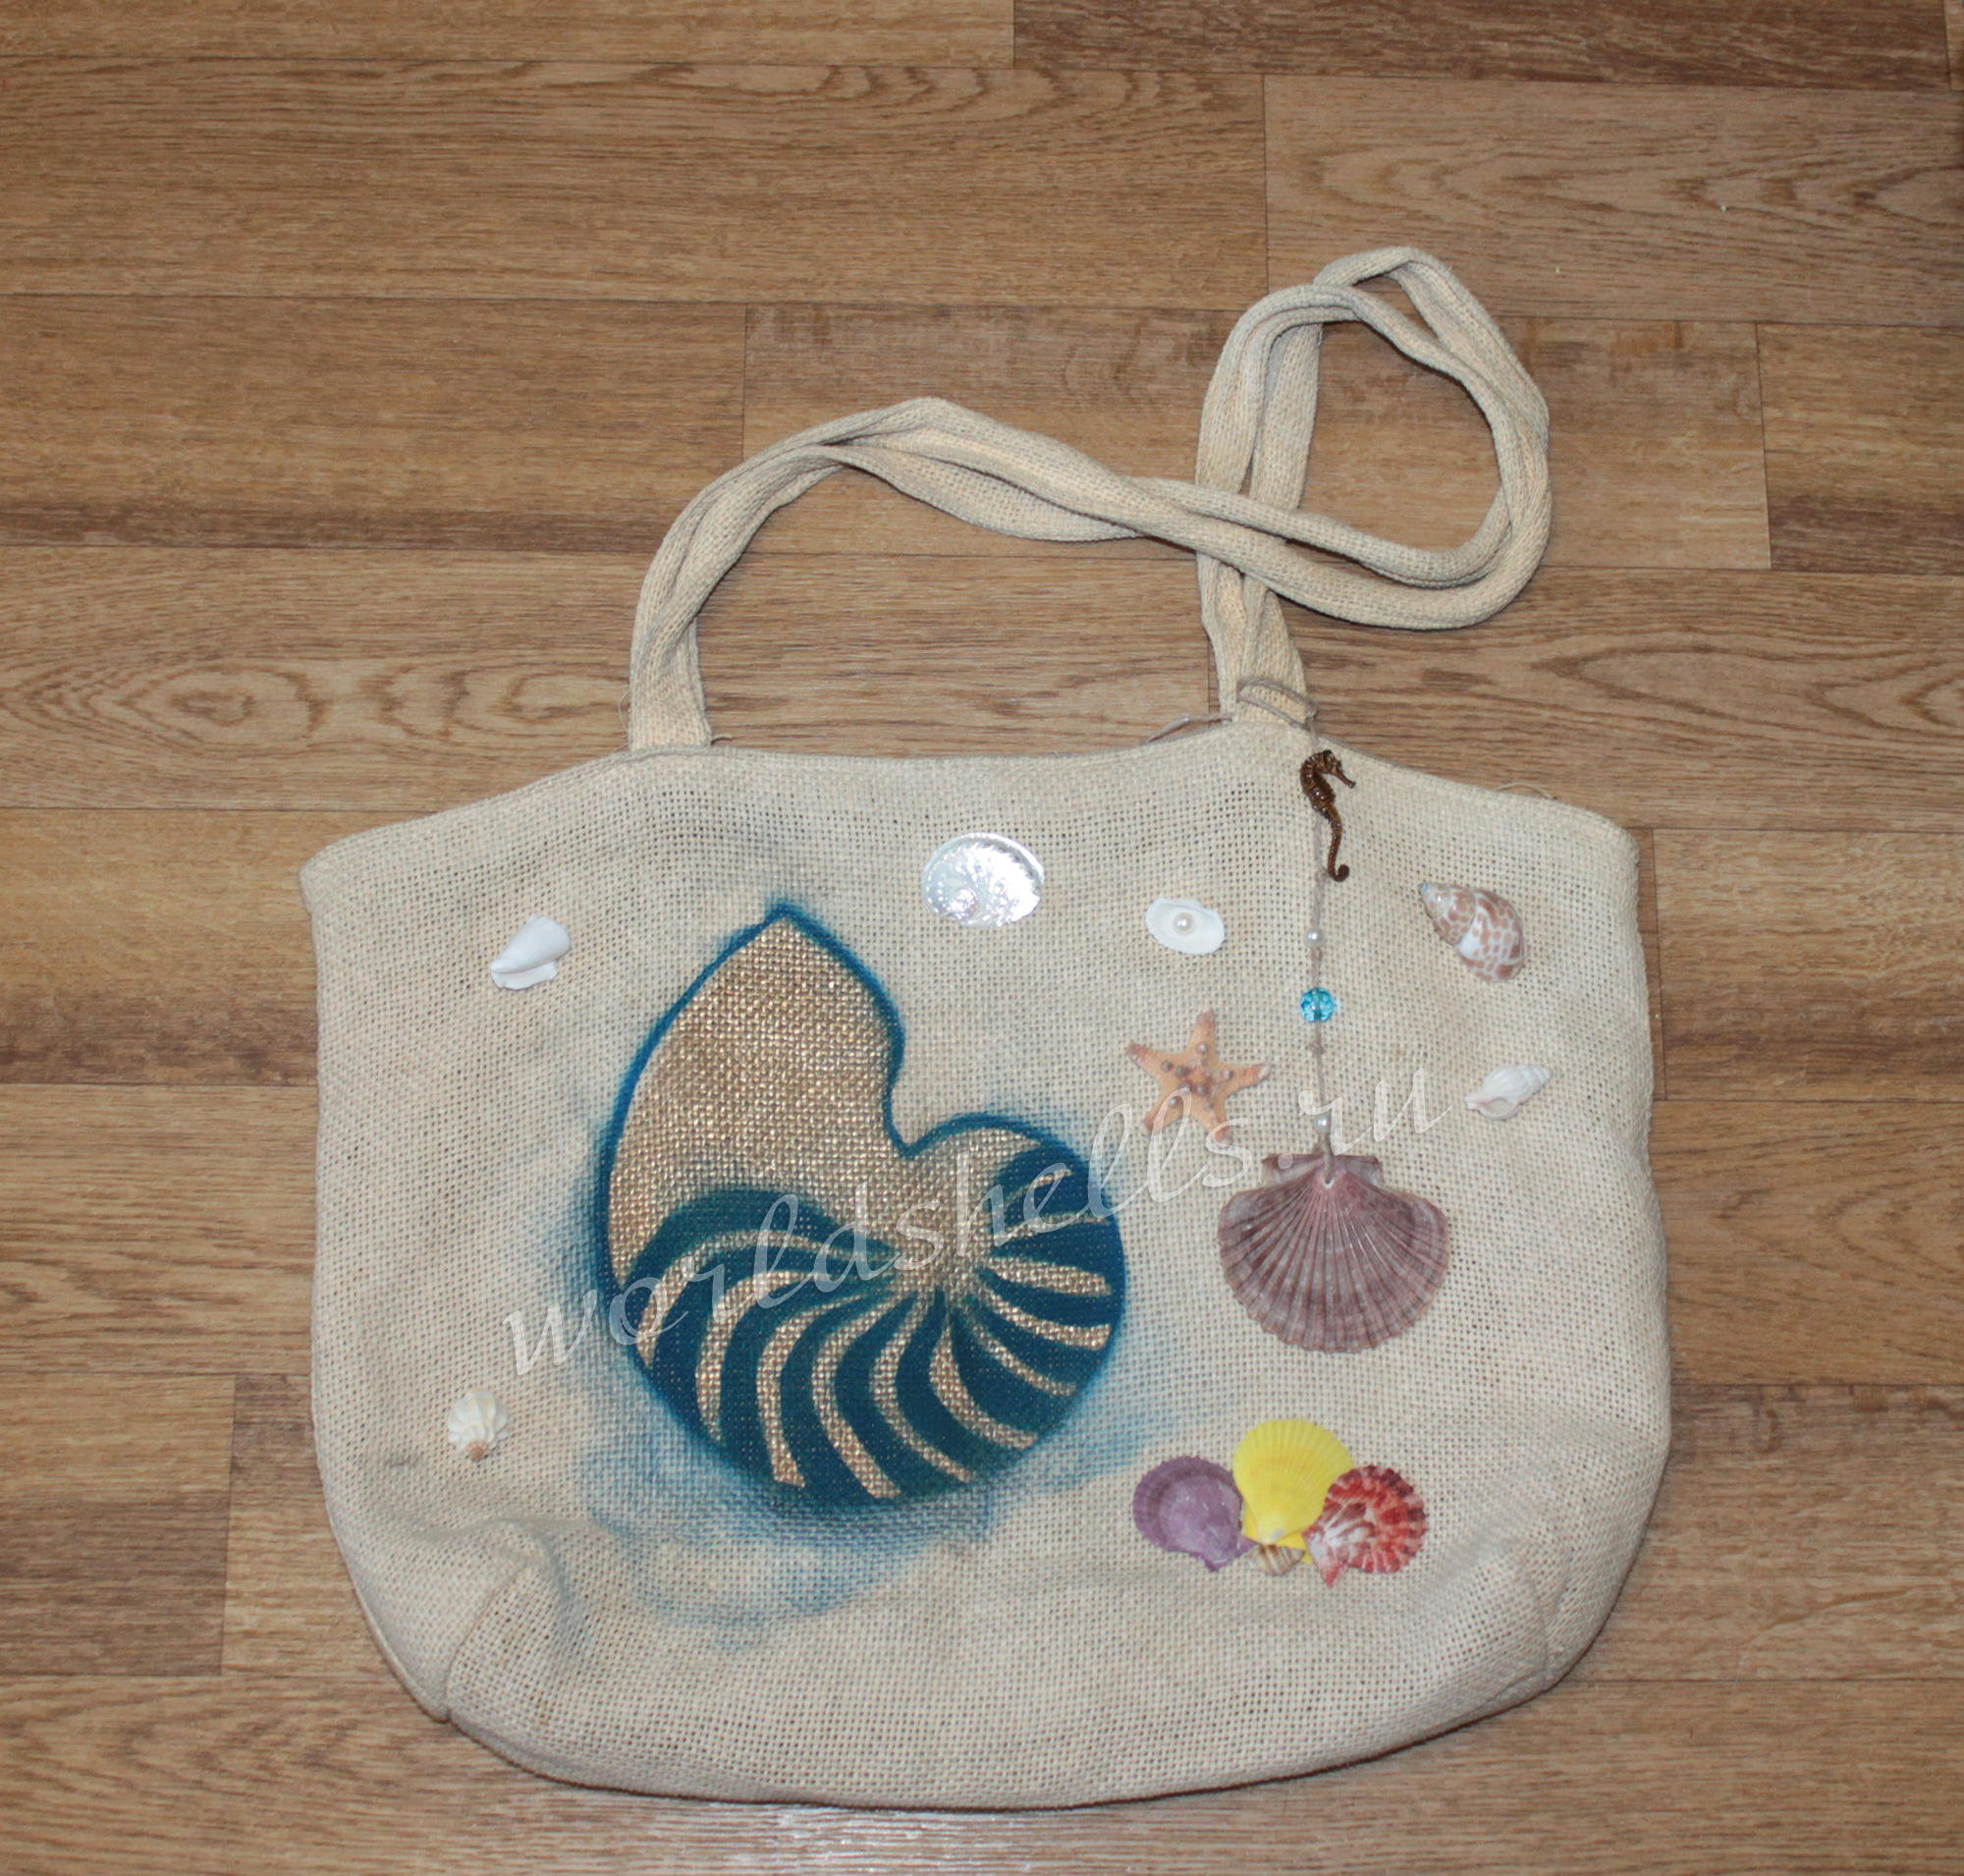 Декор сумки в морском стиле